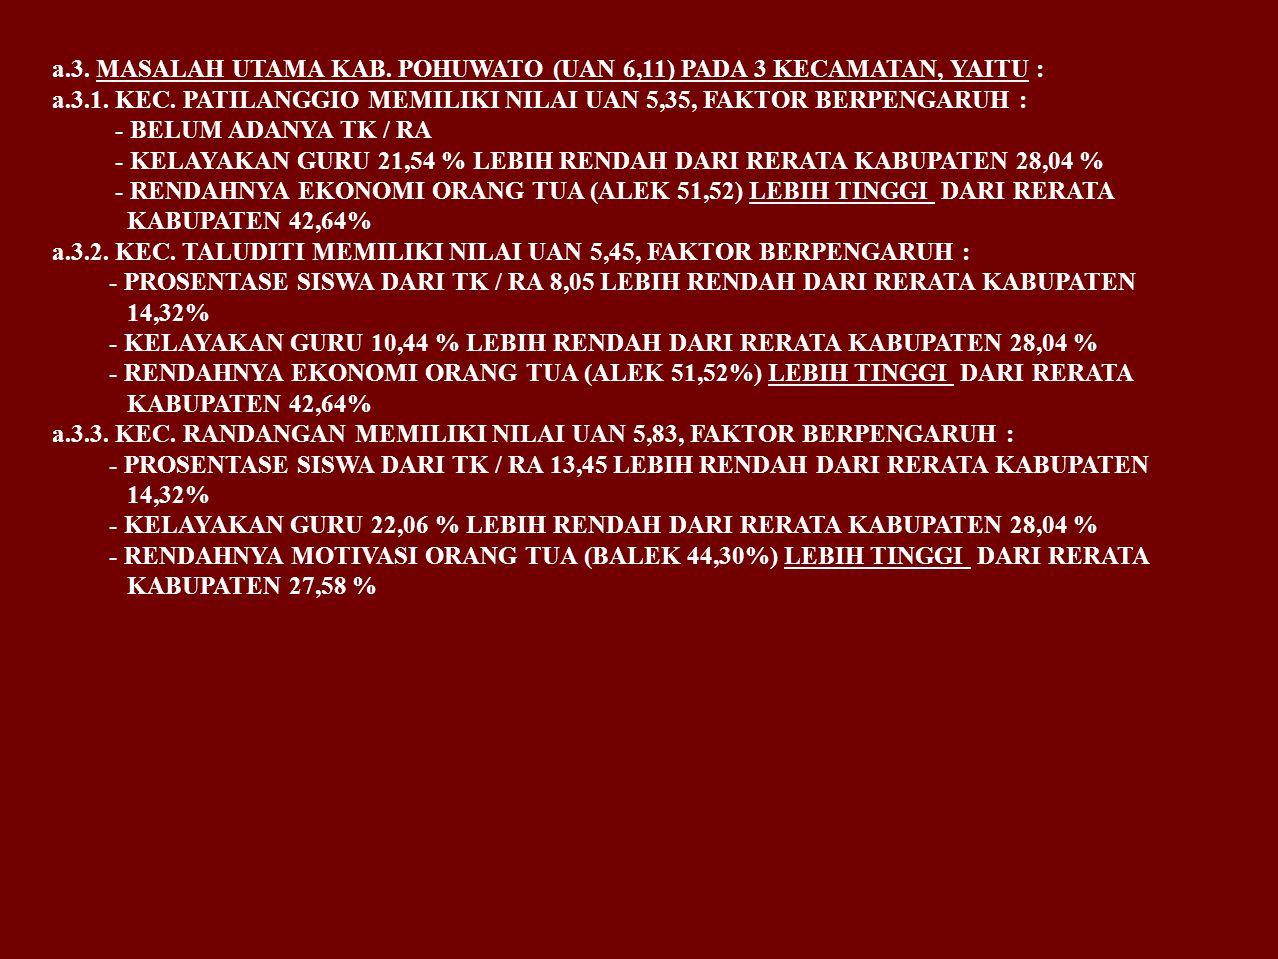 a.3. MASALAH UTAMA KAB. POHUWATO (UAN 6,11) PADA 3 KECAMATAN, YAITU :